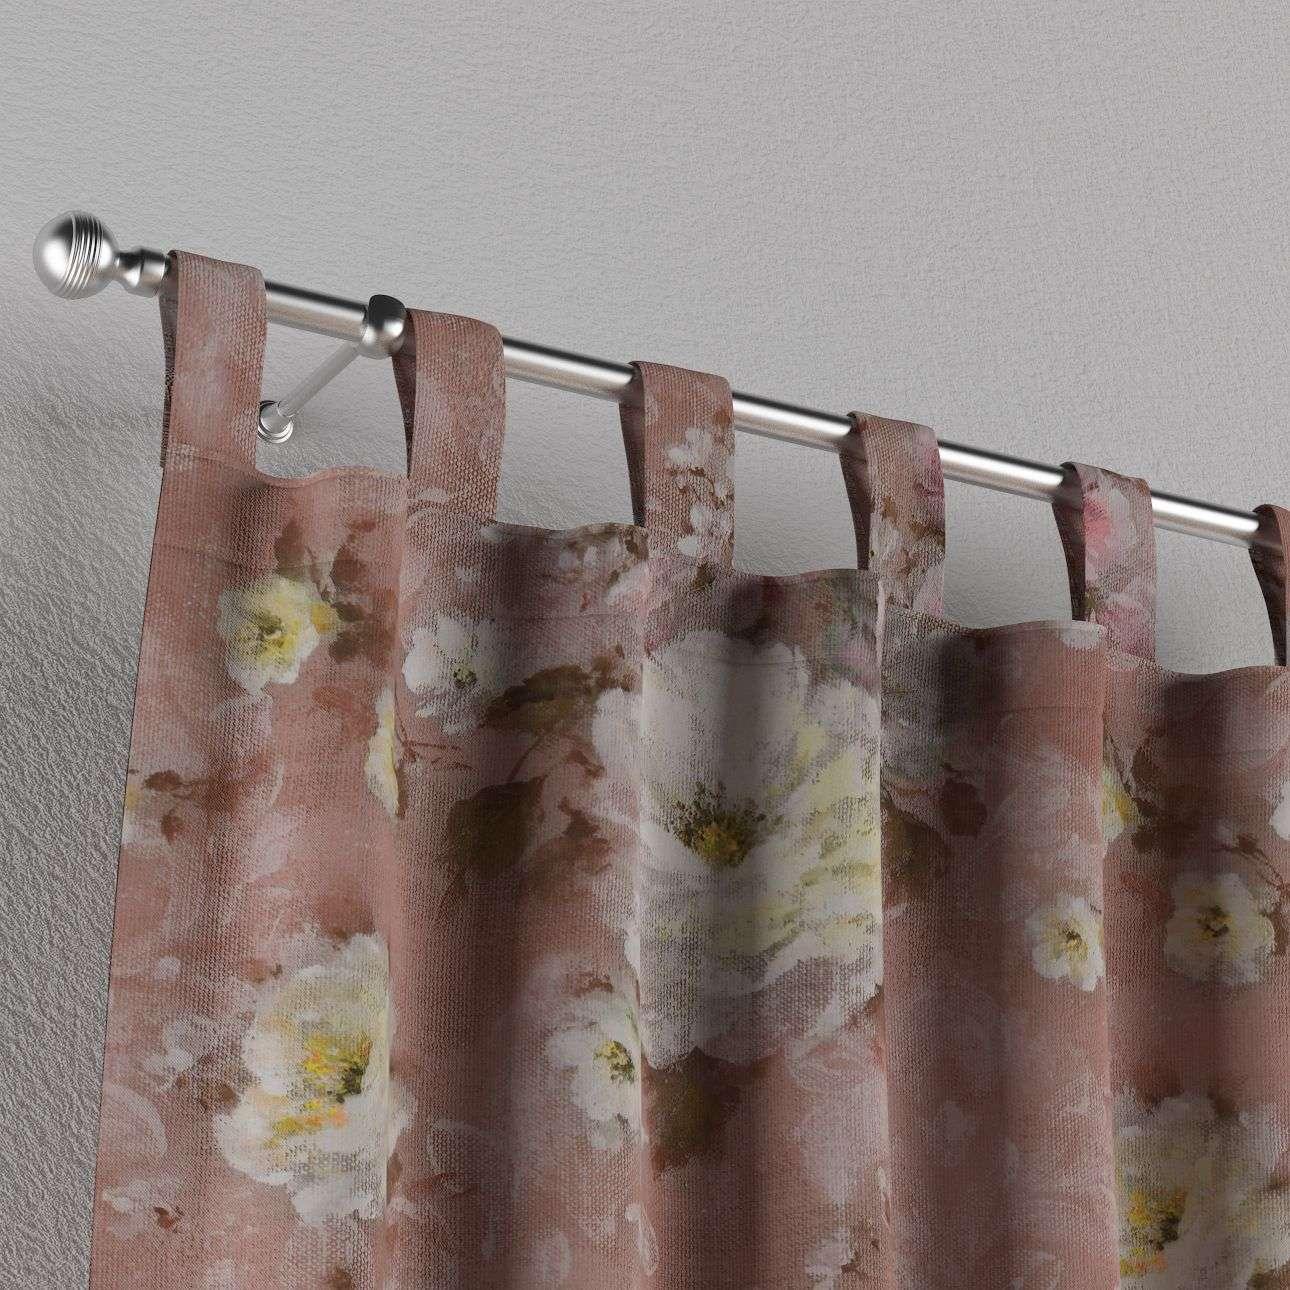 Zasłona na szelkach 1 szt. 1szt 130x260 cm w kolekcji Monet, tkanina: 137-83